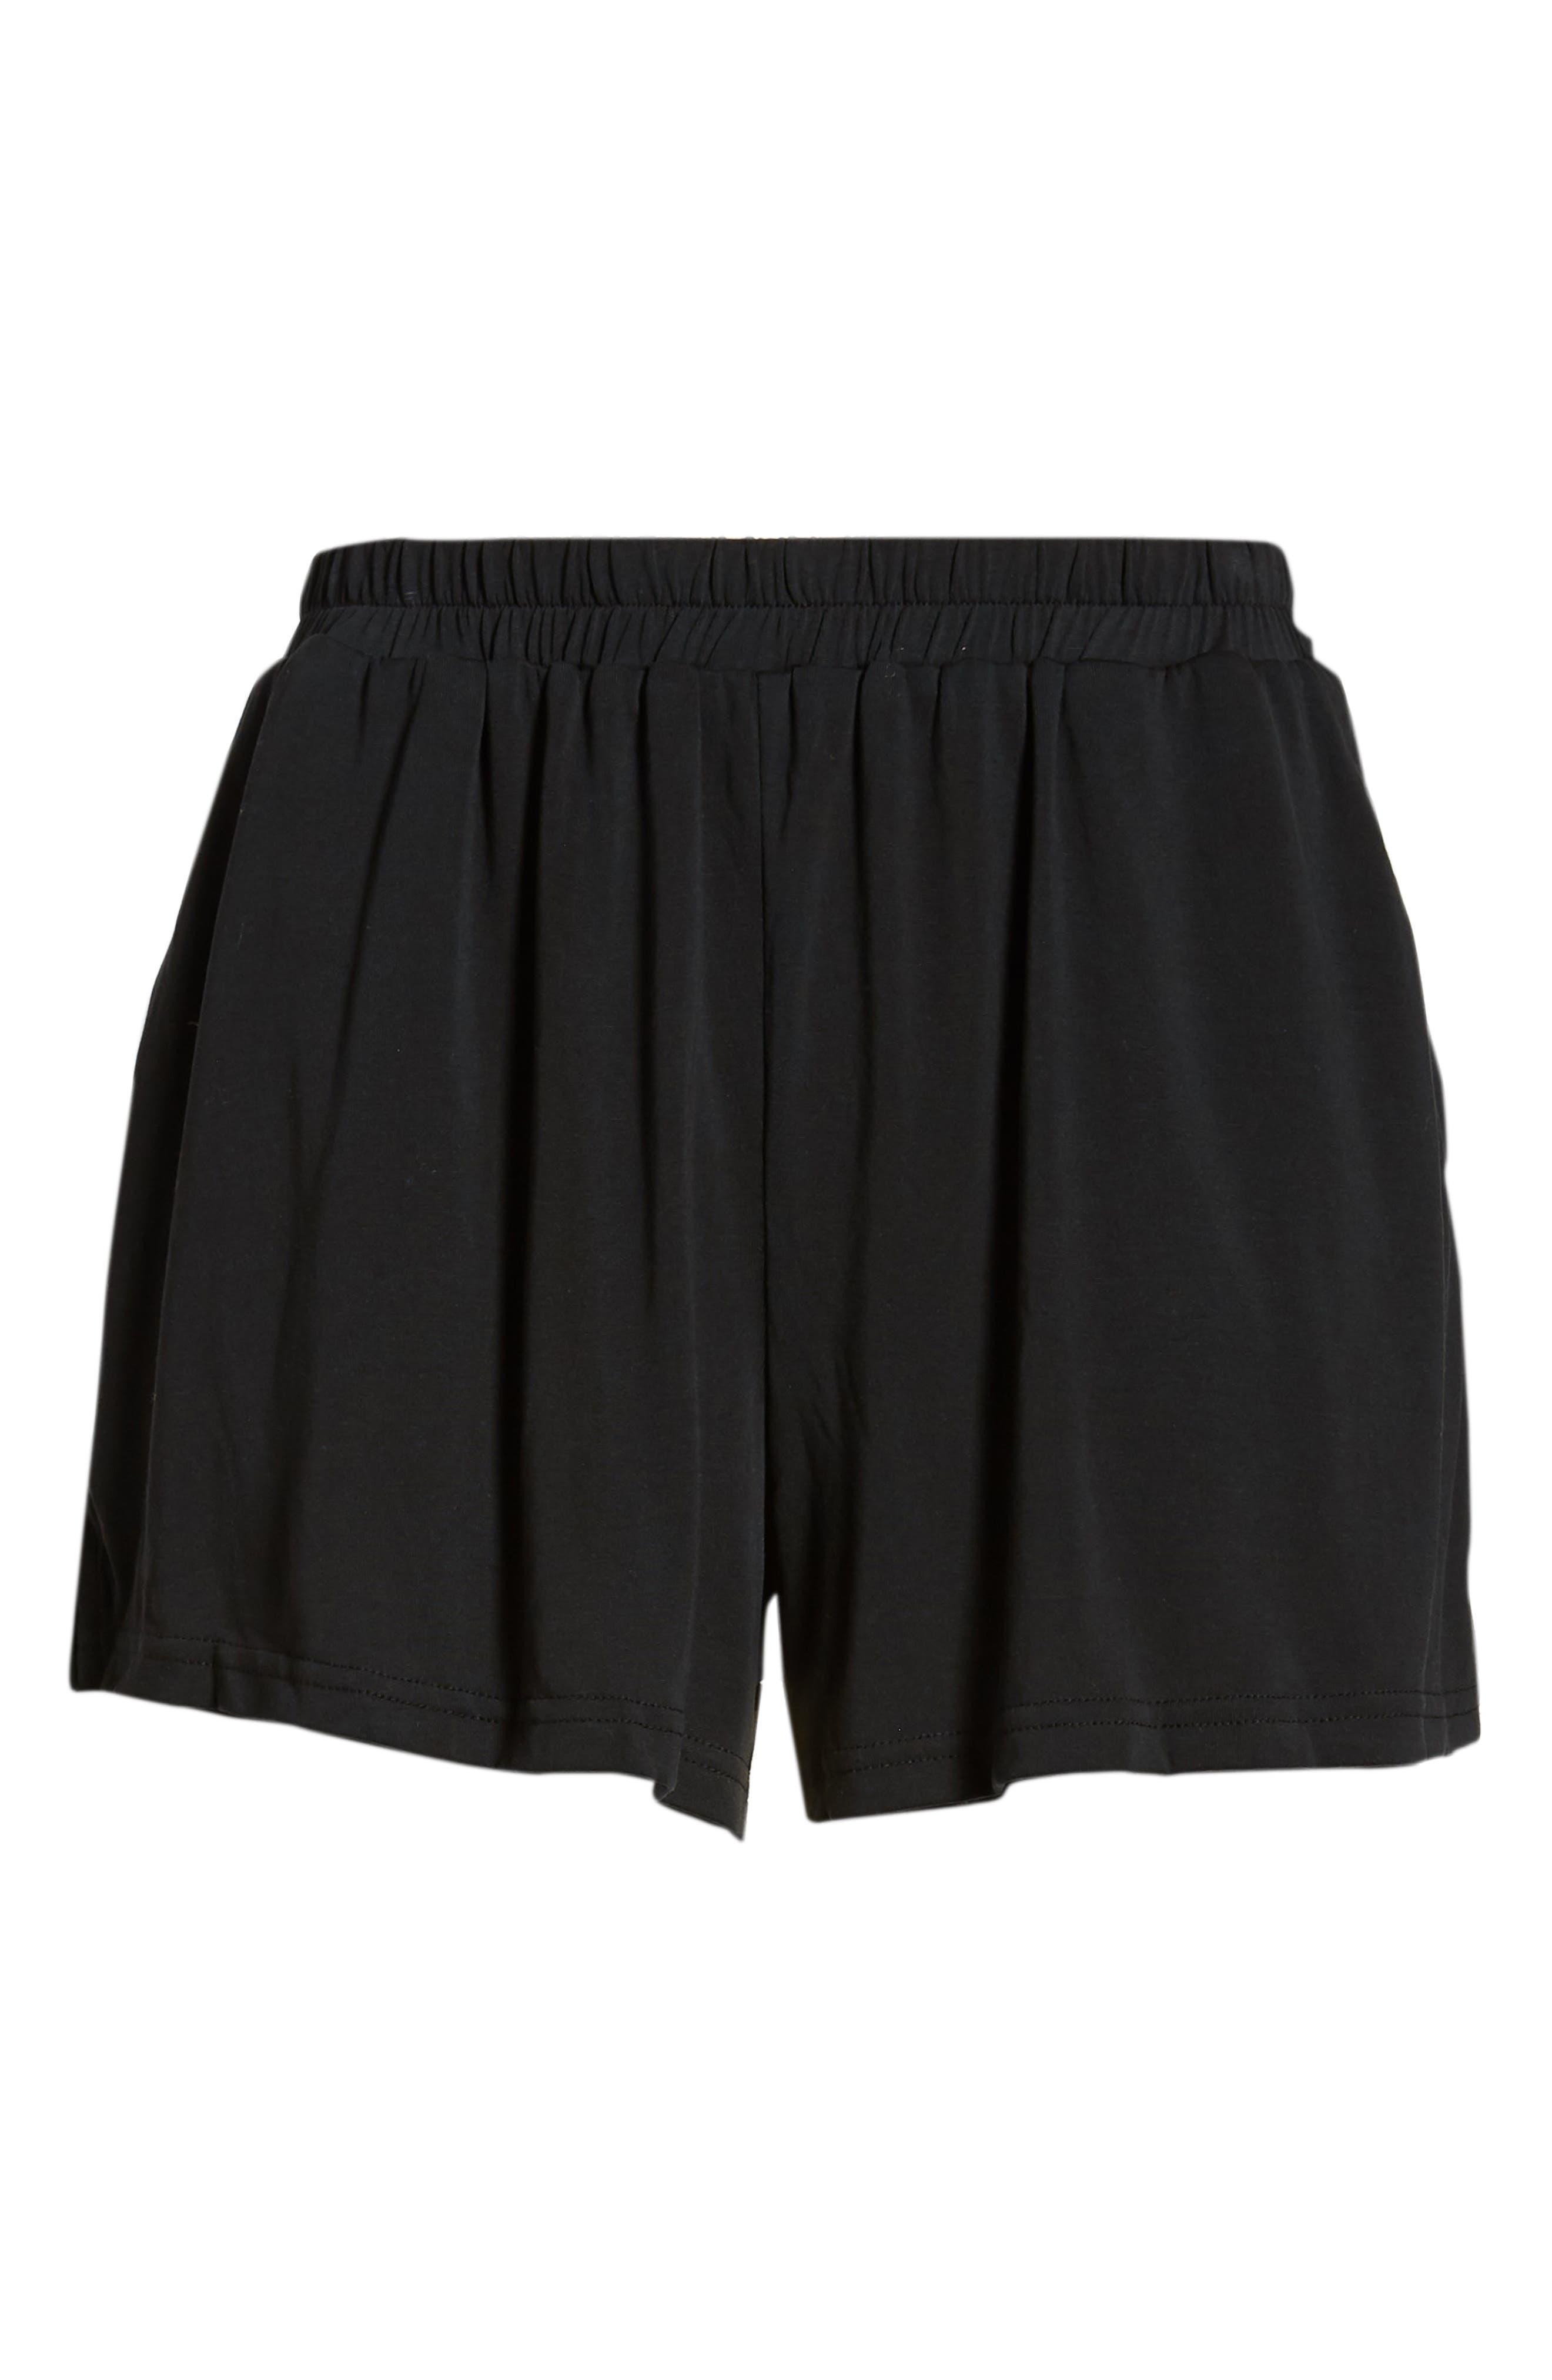 Laguna Shorts,                             Alternate thumbnail 6, color,                             Black